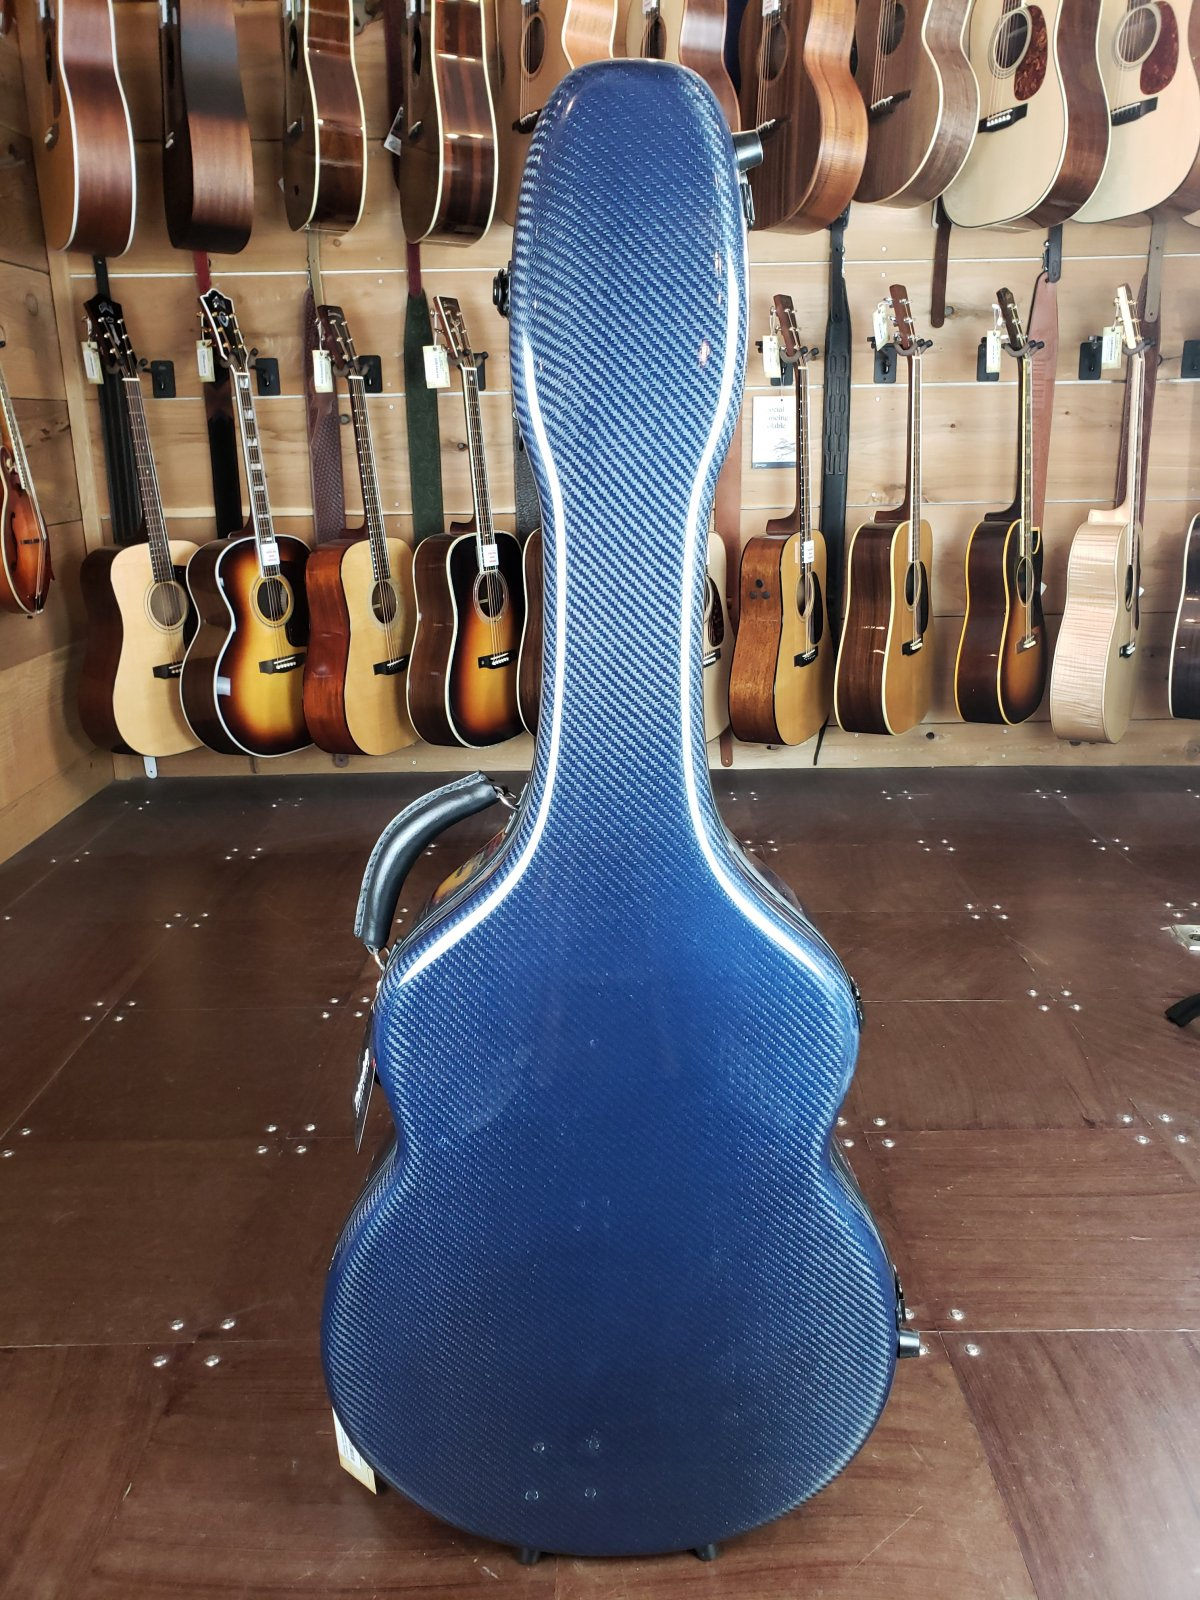 Hoffee Deluxe Acoustic Carbon Fiber Guitar Case (Dreadnought) Deluxe Blue